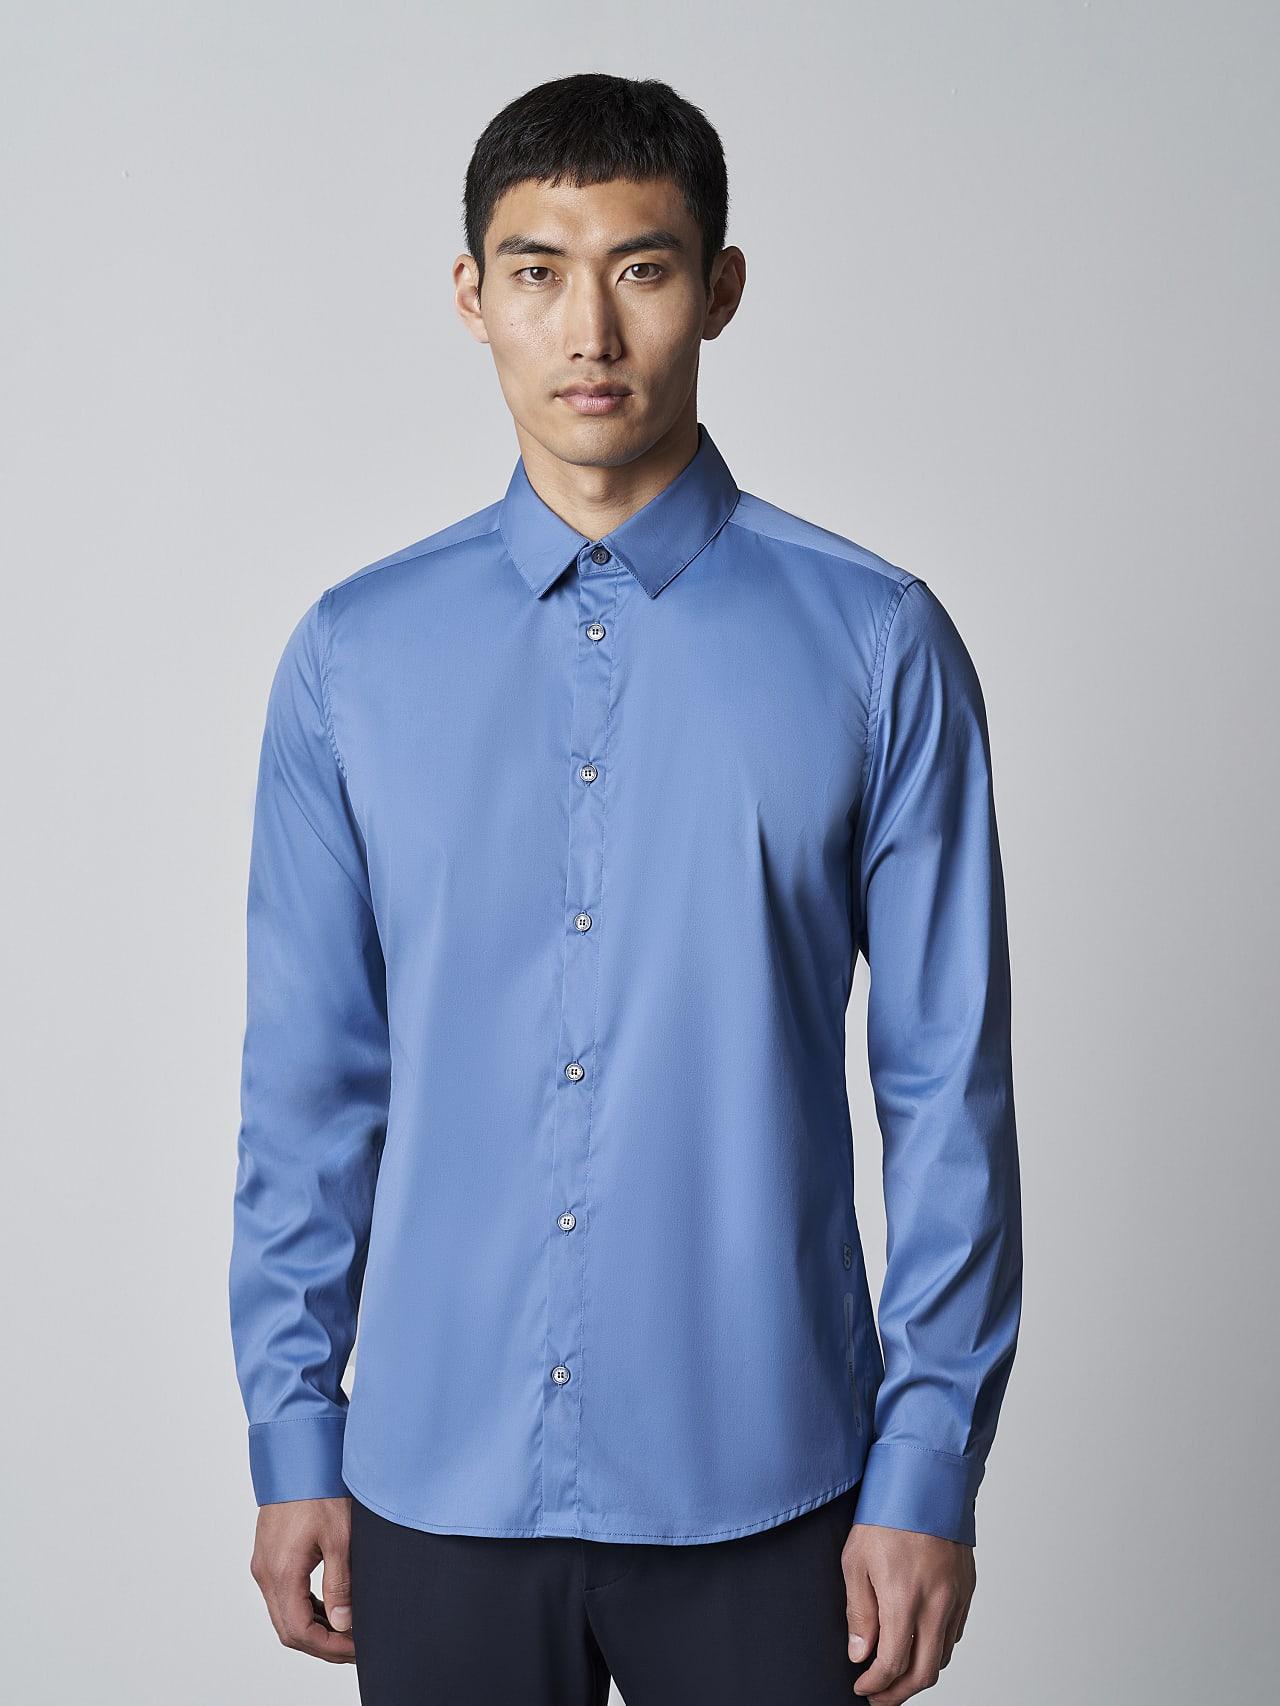 WAARG V2.Y5.02 Easy-Care Cotton Shirt light blue Front Alpha Tauri